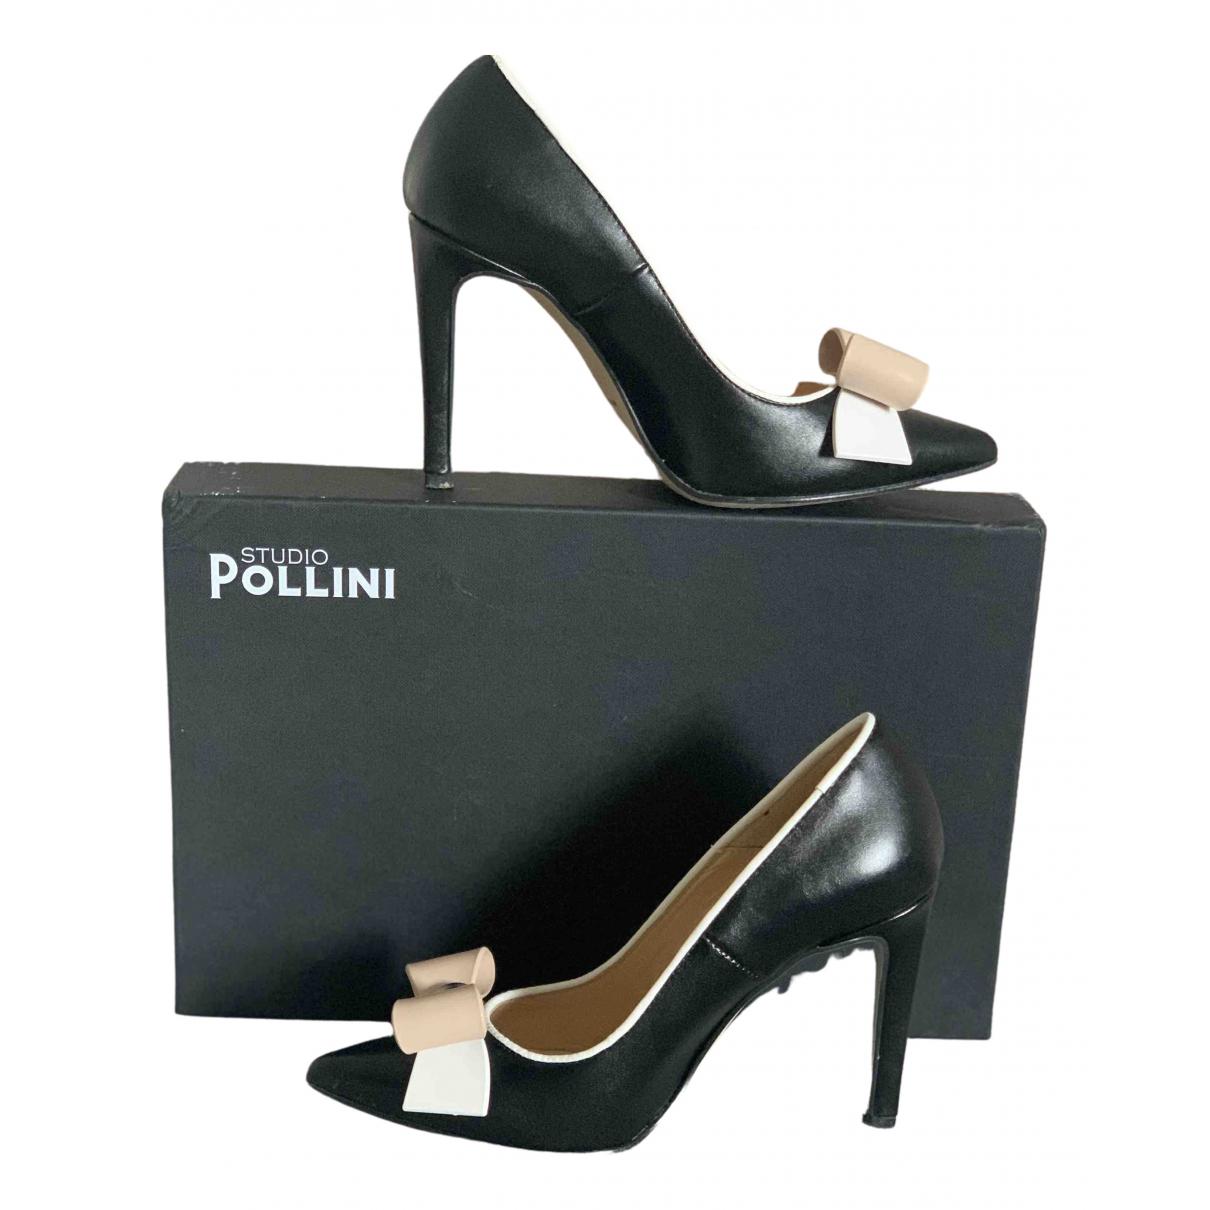 Pollini \N Pumps in  Schwarz Leder